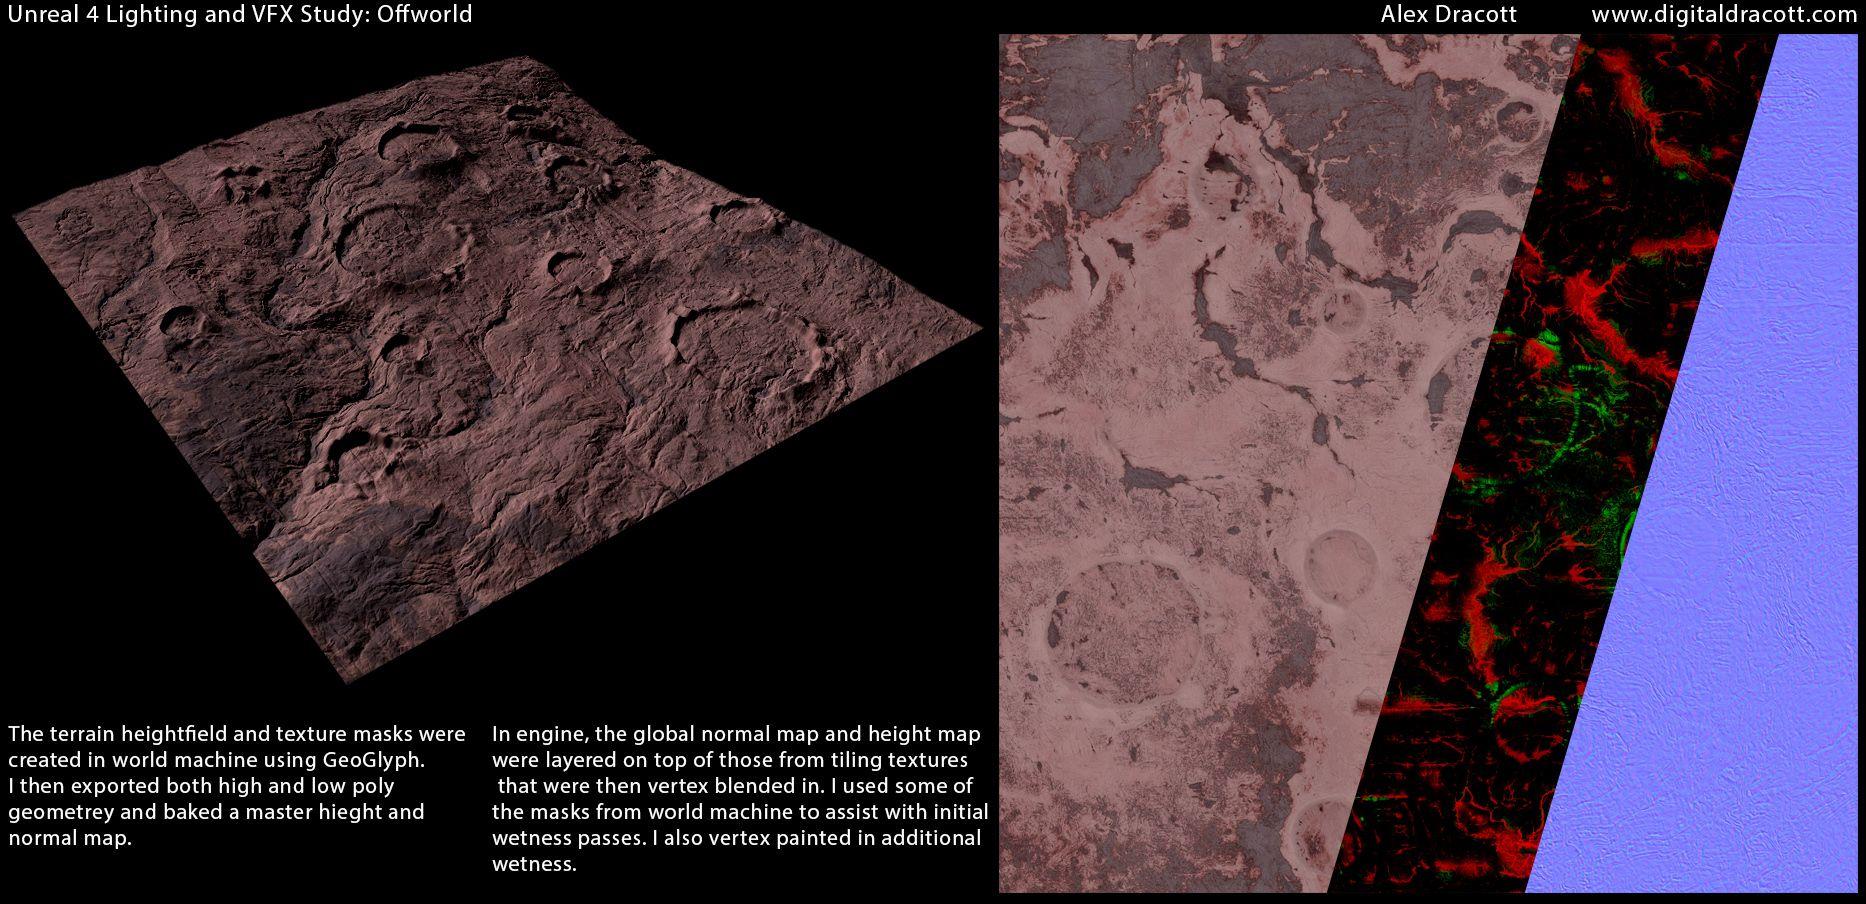 Ue4 Lighting Study Offworld With Images Unreal Engine Light